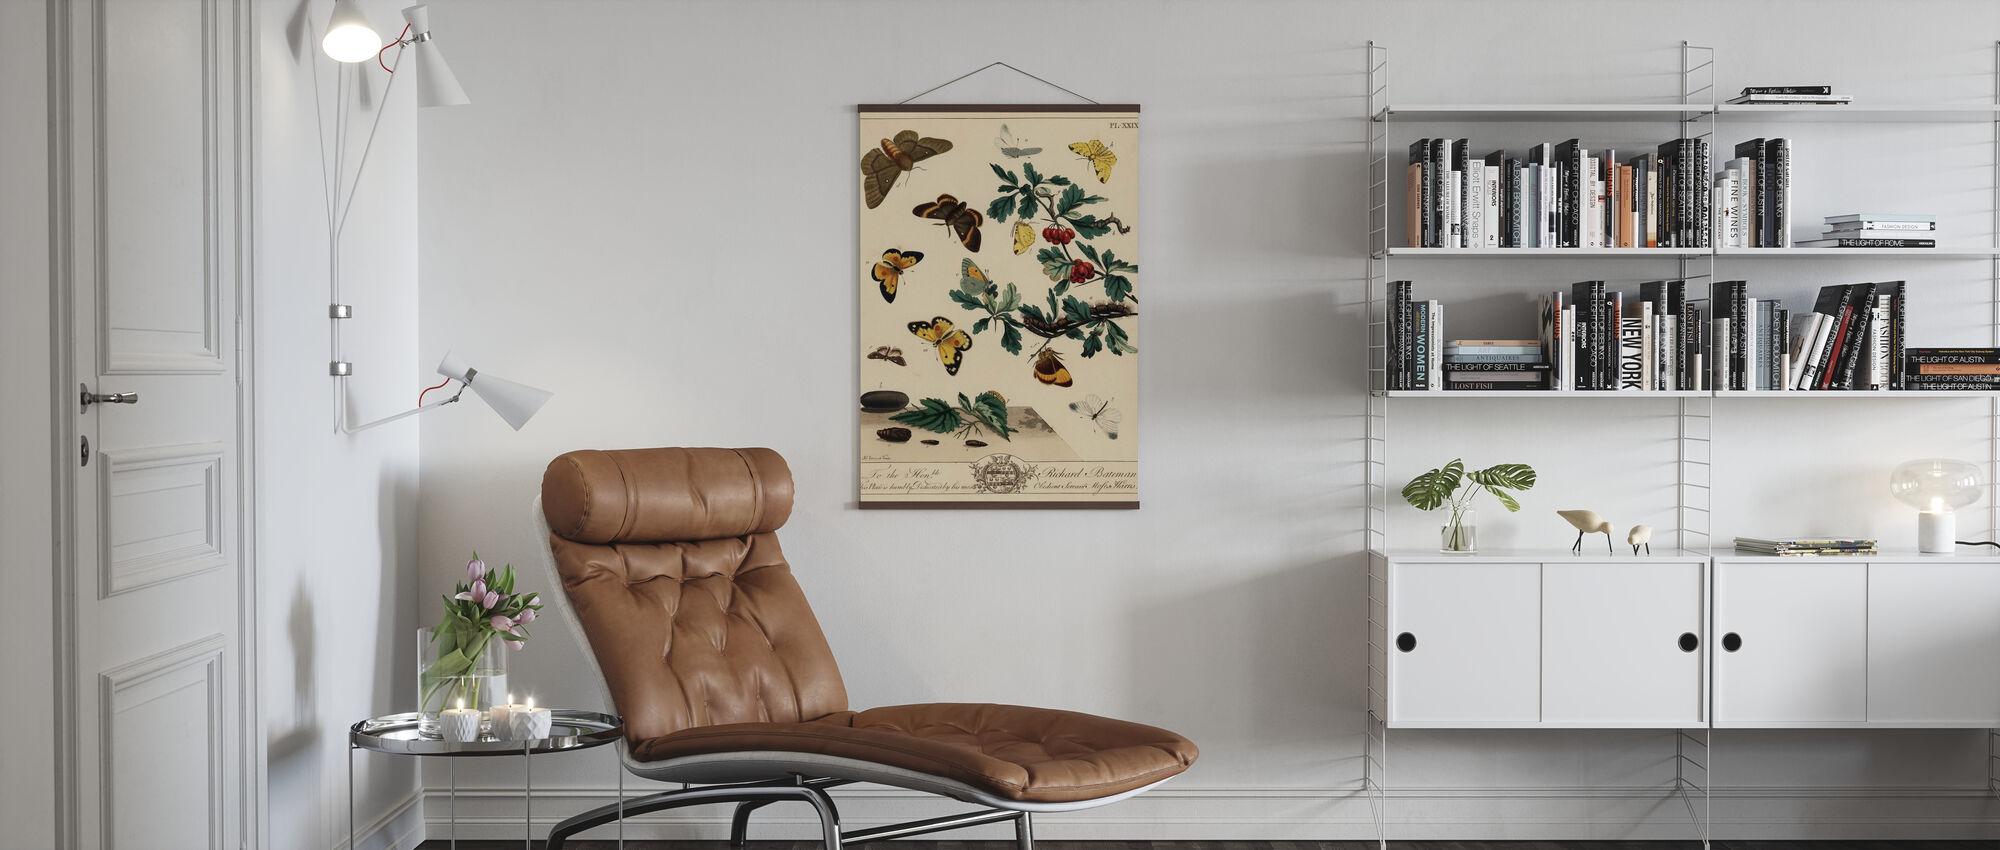 Skipper fjäril - Moses Harris - Poster - Vardagsrum